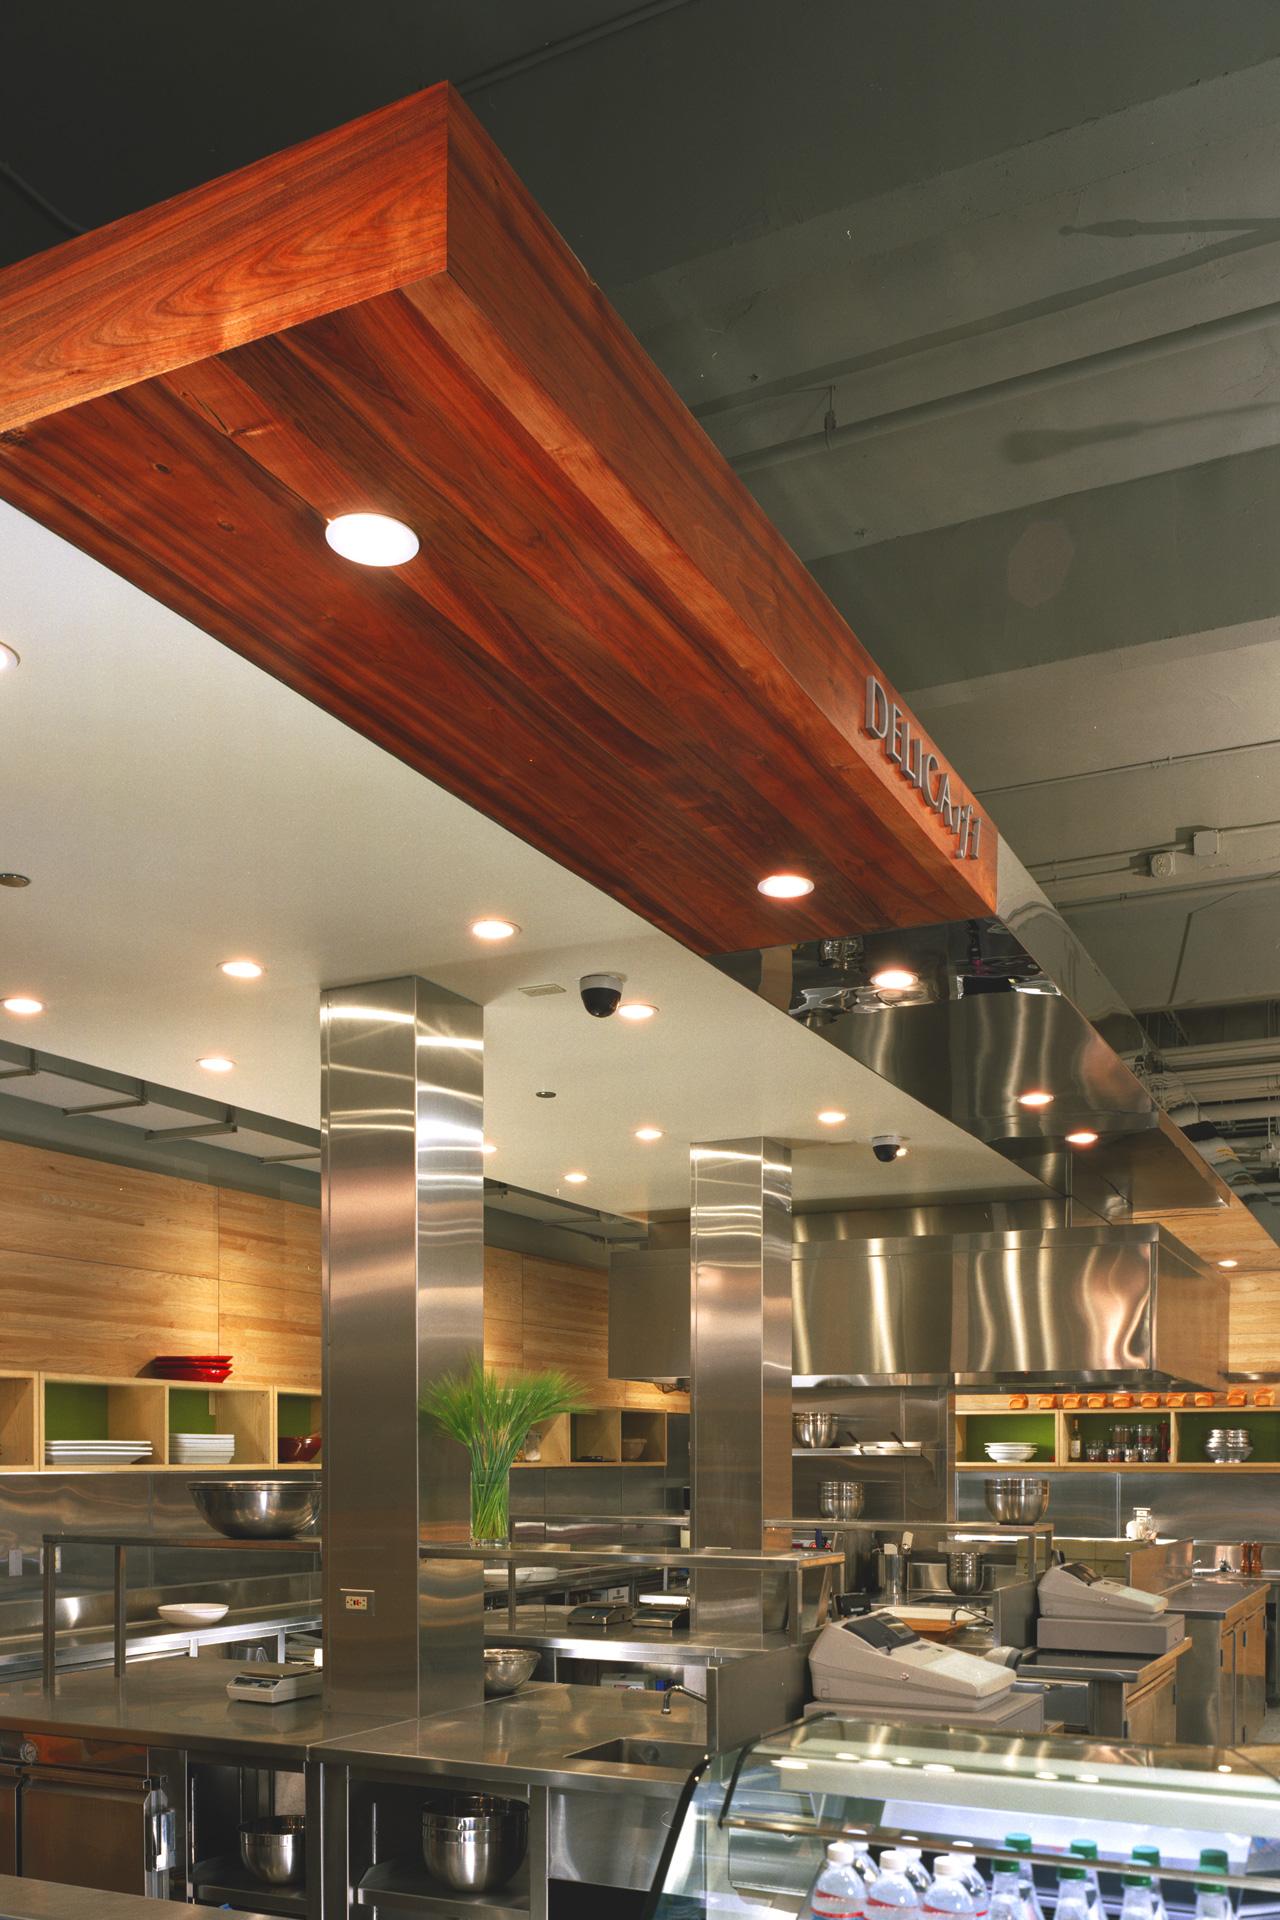 Delica restaurant